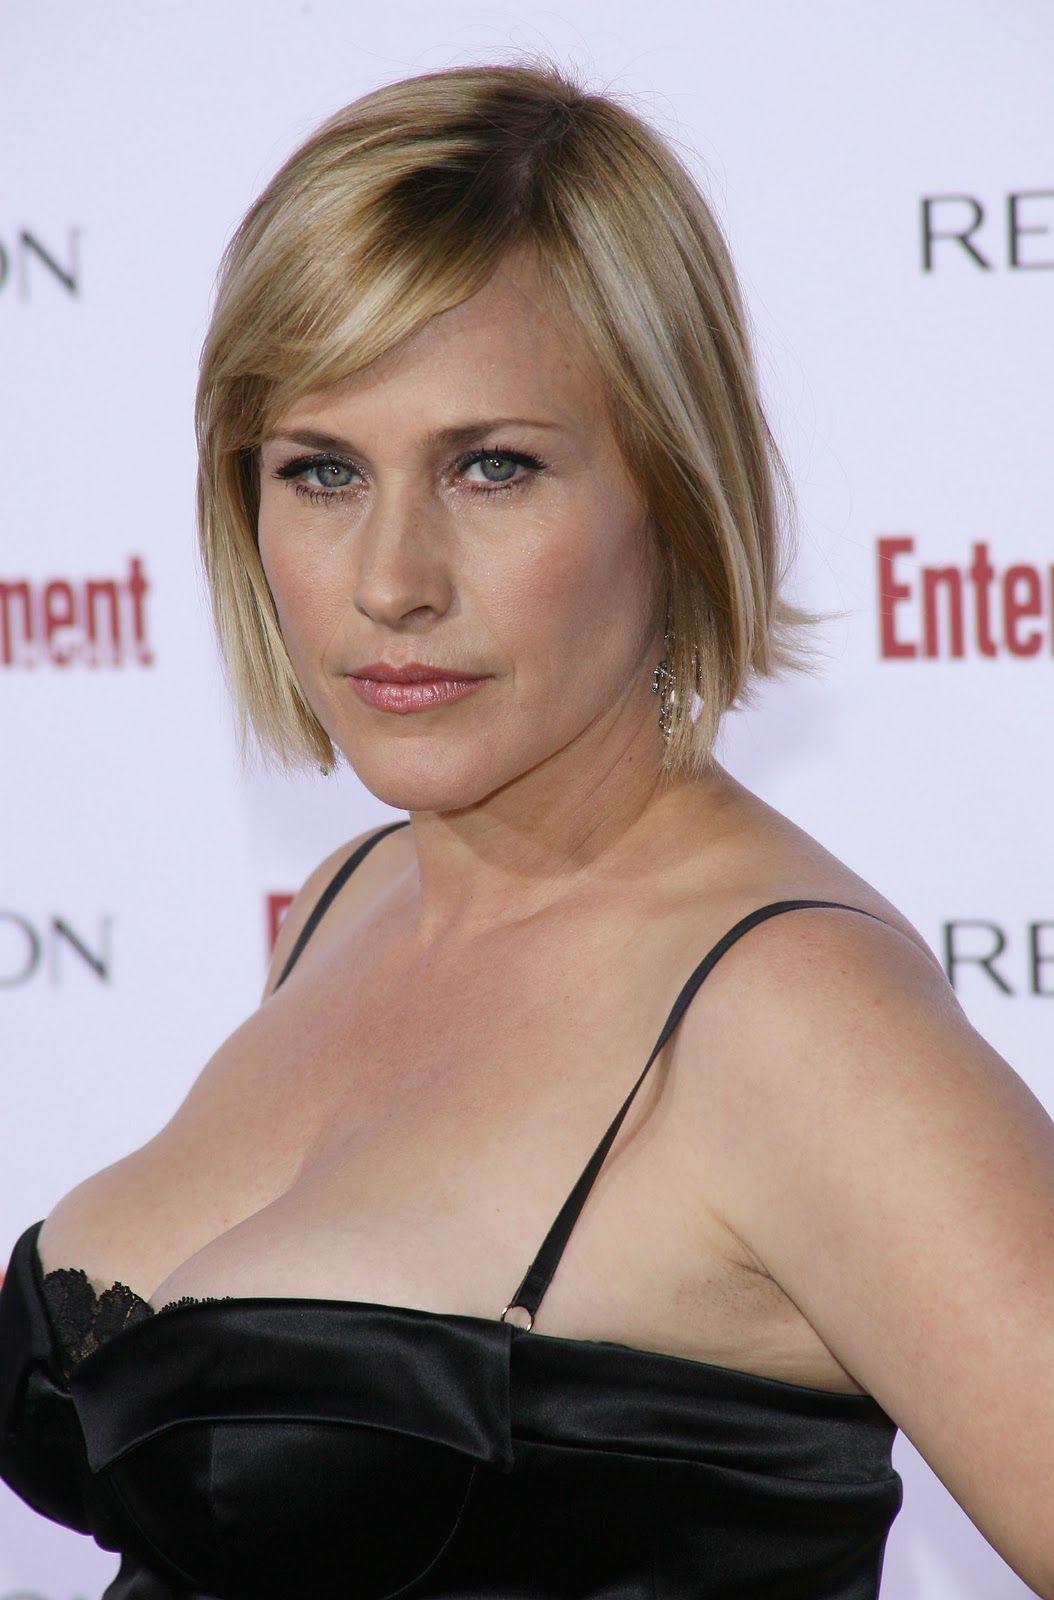 Article Top Stars Mar 11 2012 Patricia Arquette Celebrities Patricia